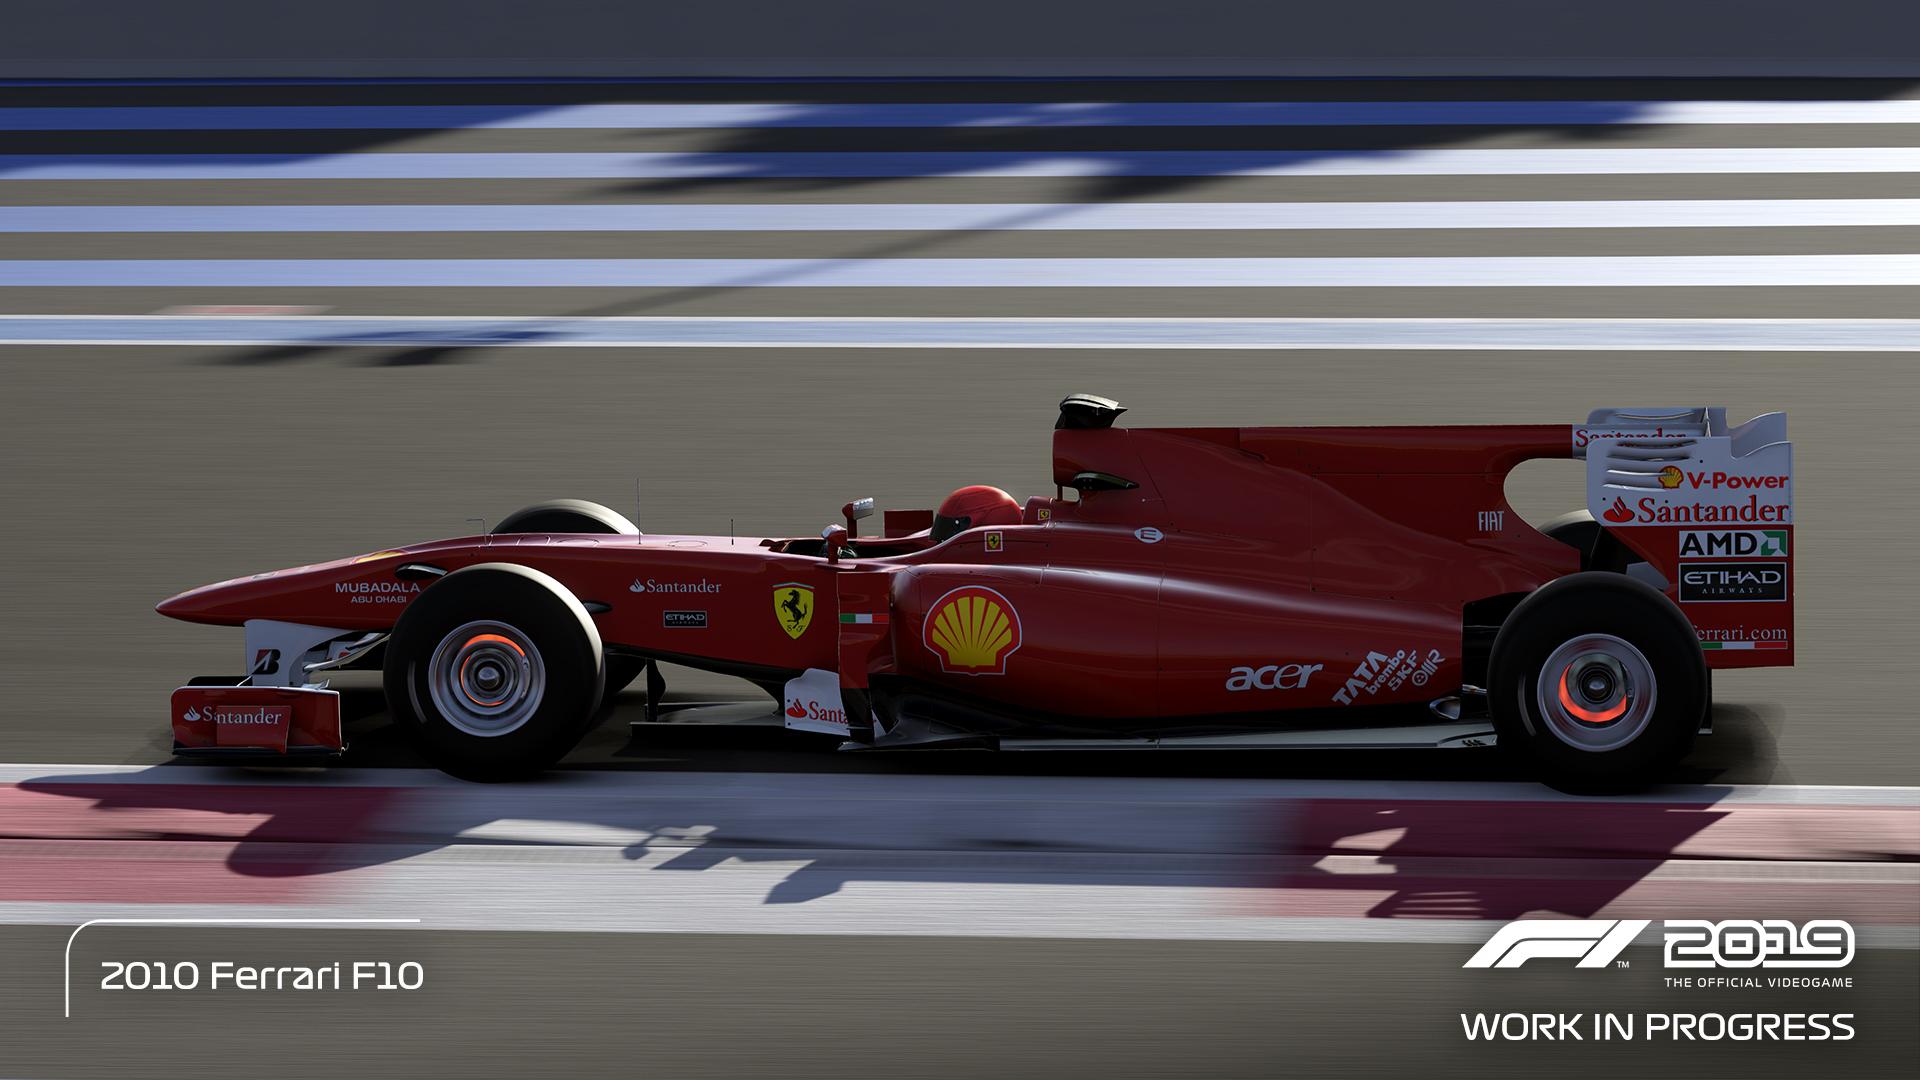 F1 2019 Trailer and Historics .jpg